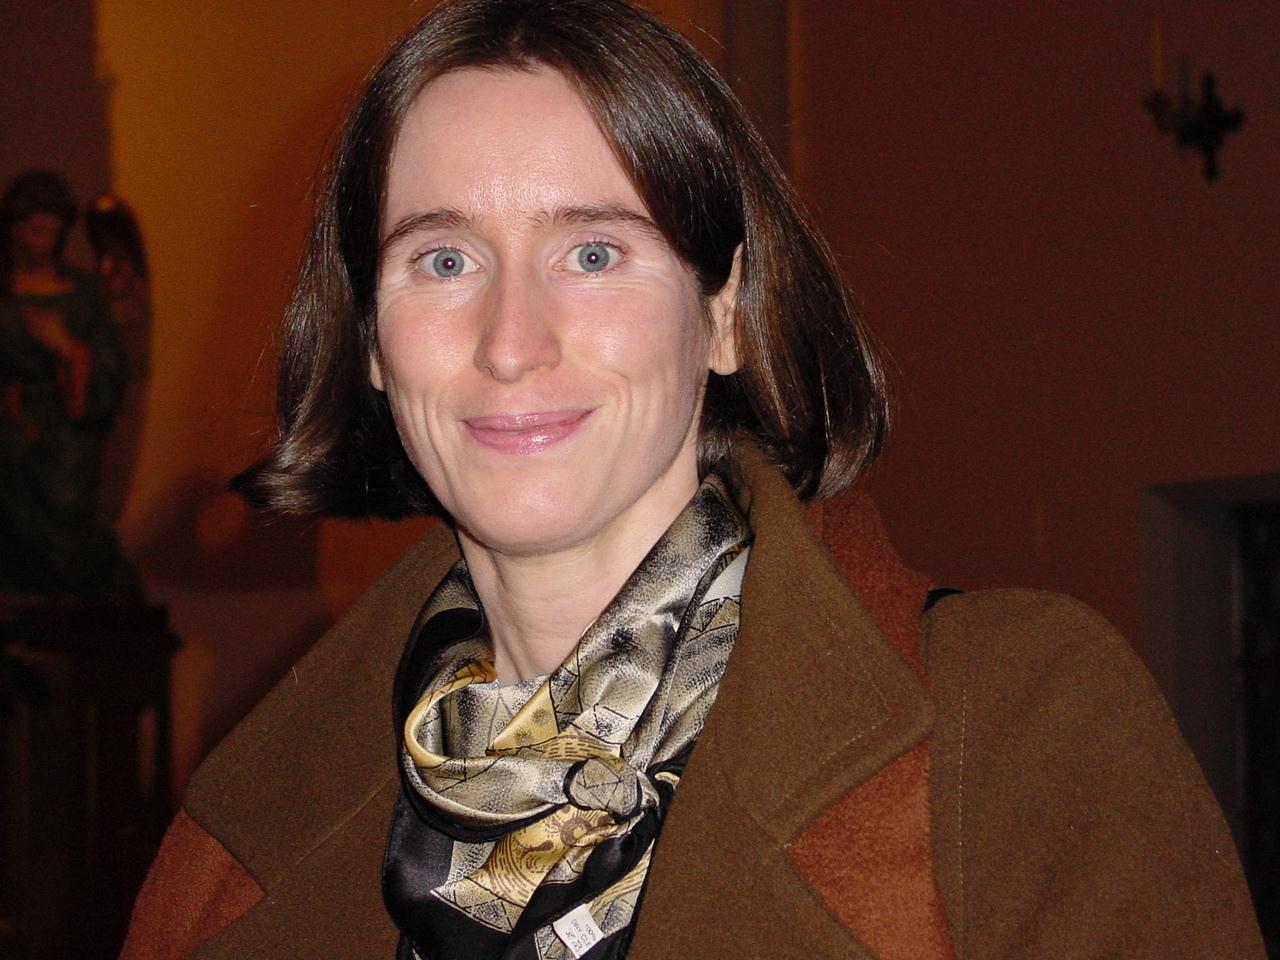 Dr. Barbara Stühlmeyer